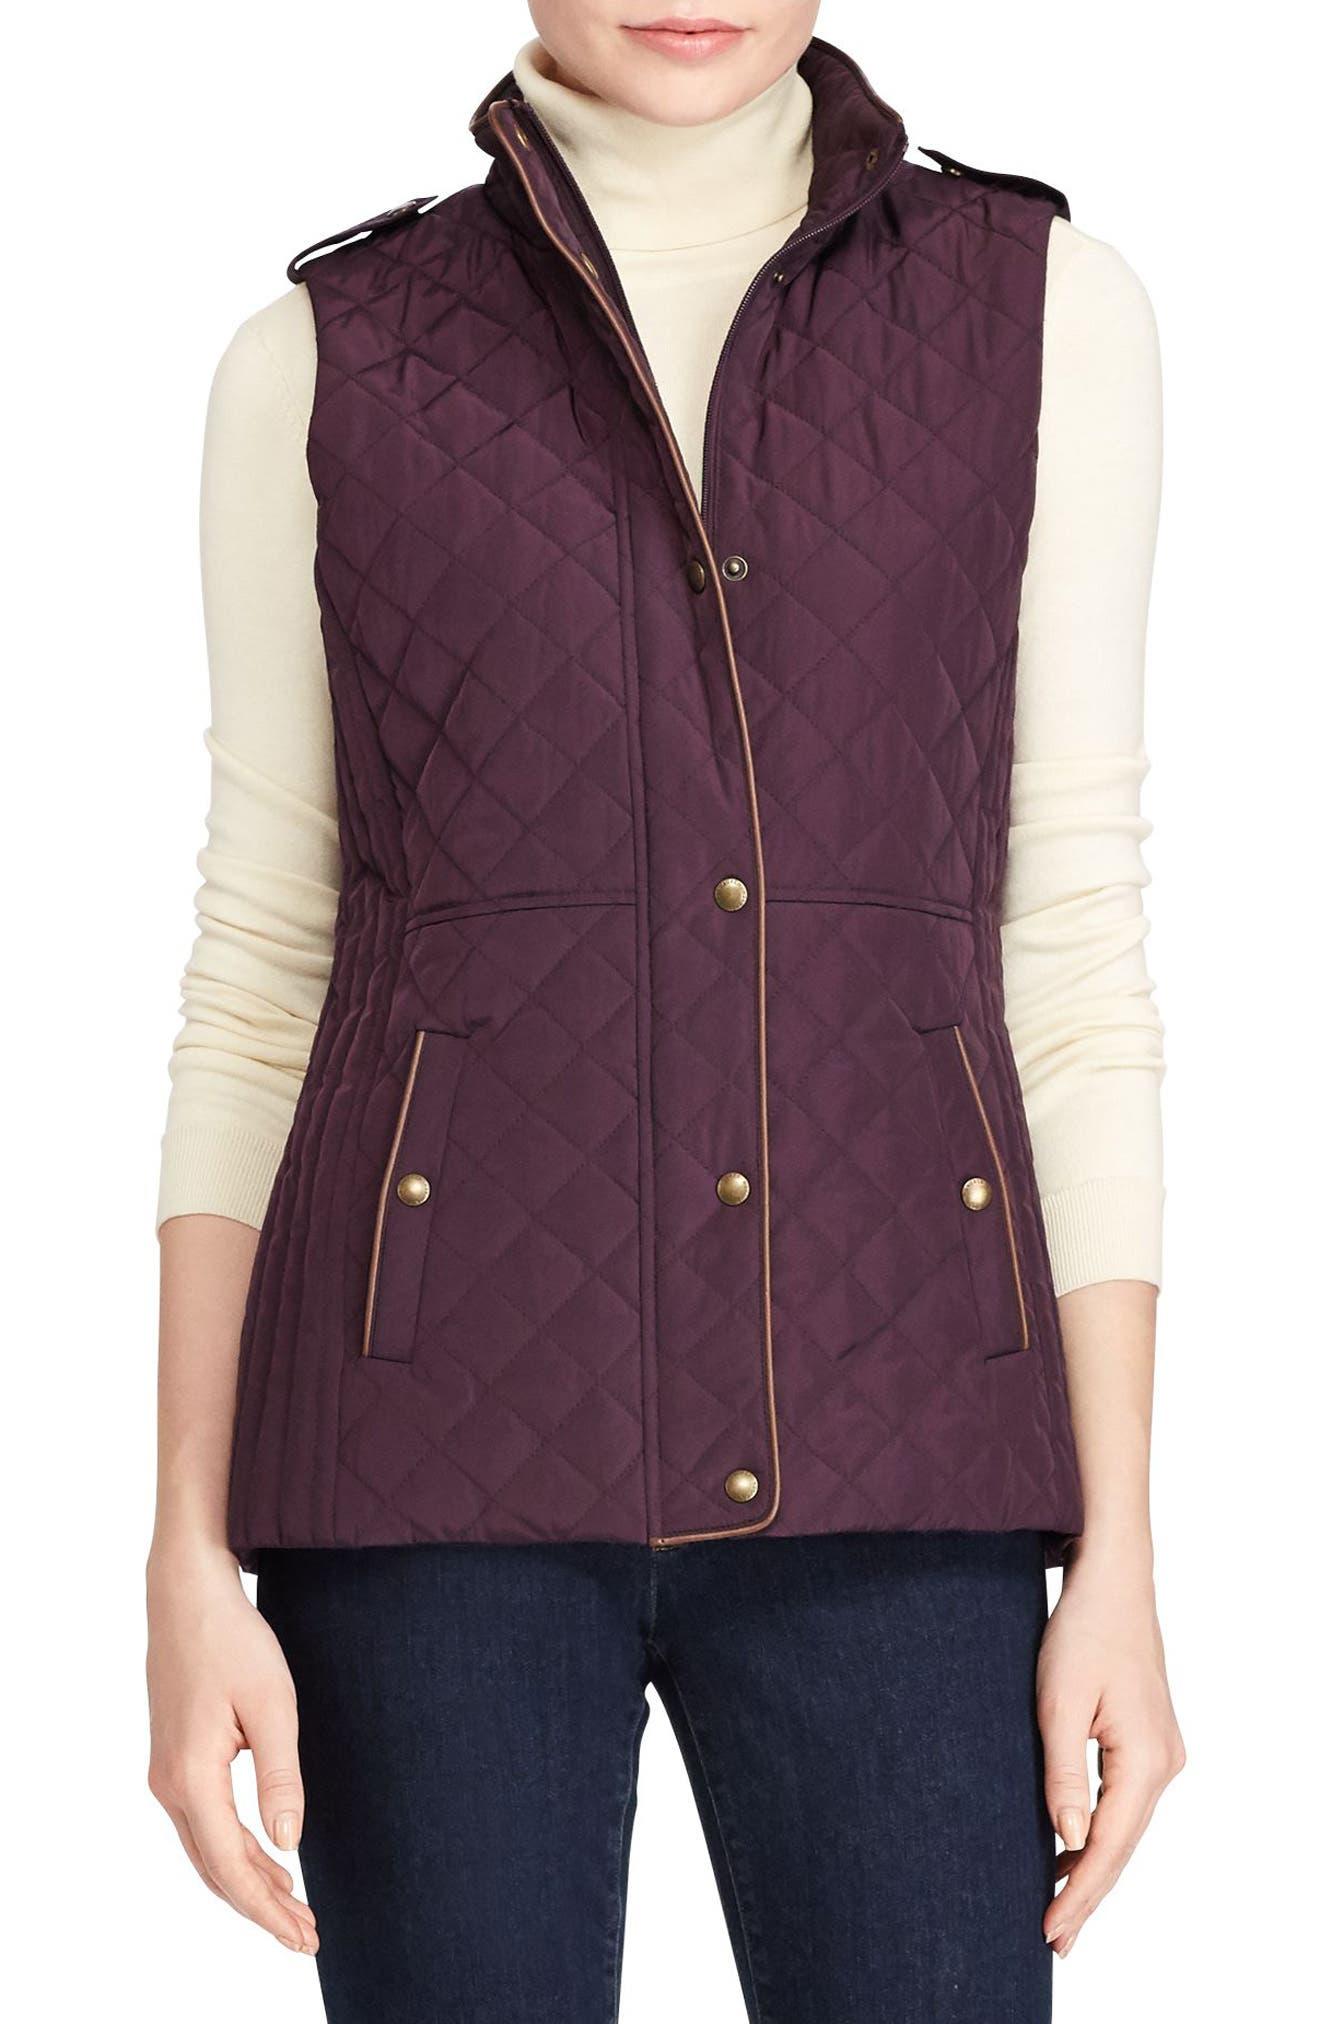 Lauren Ralph Lauren Faux Leather Trim Quilted Vest (Regular & Petite)